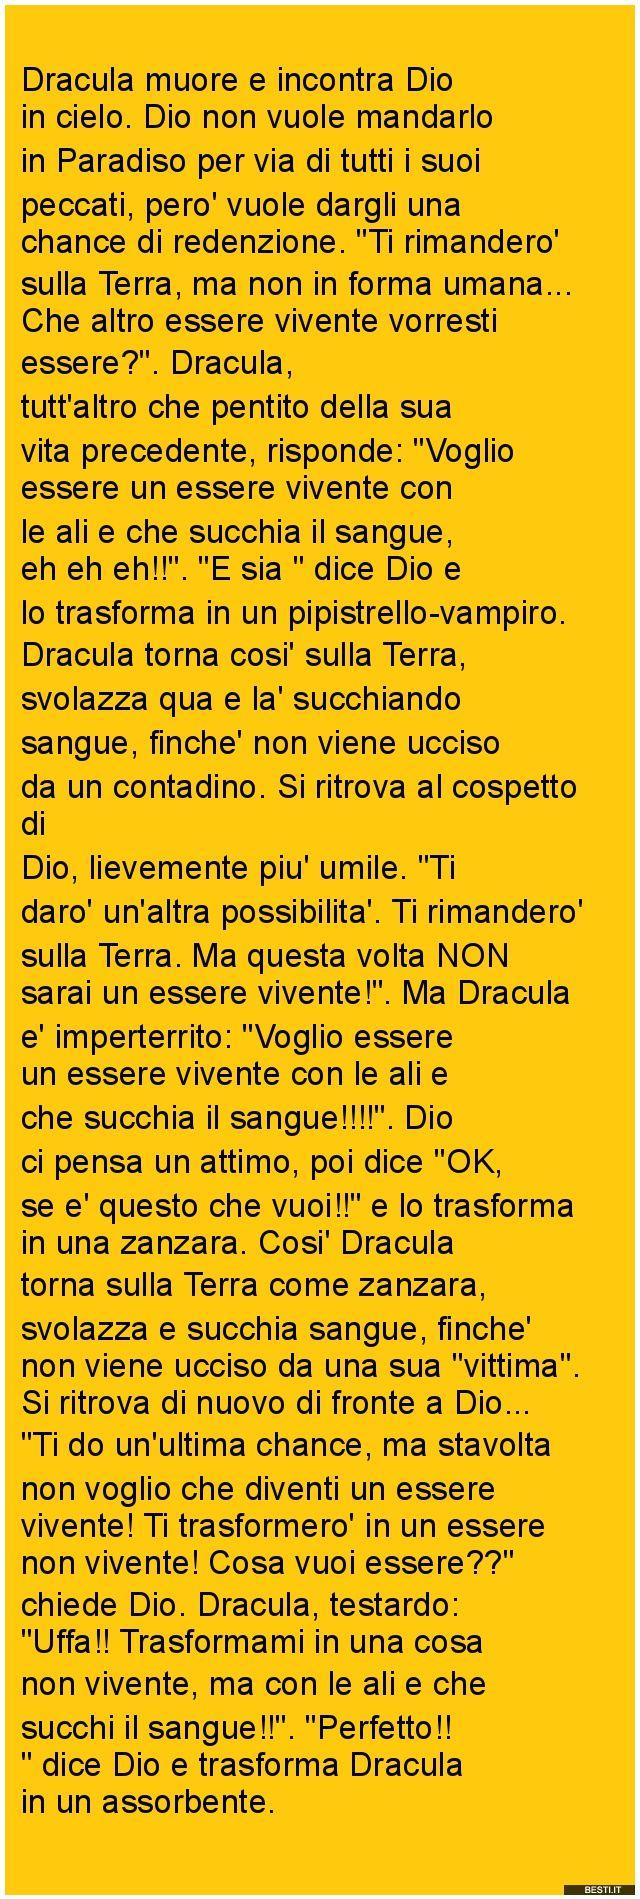 Dracula muore | BESTI.it - immagini divertenti, foto, barzellette, video